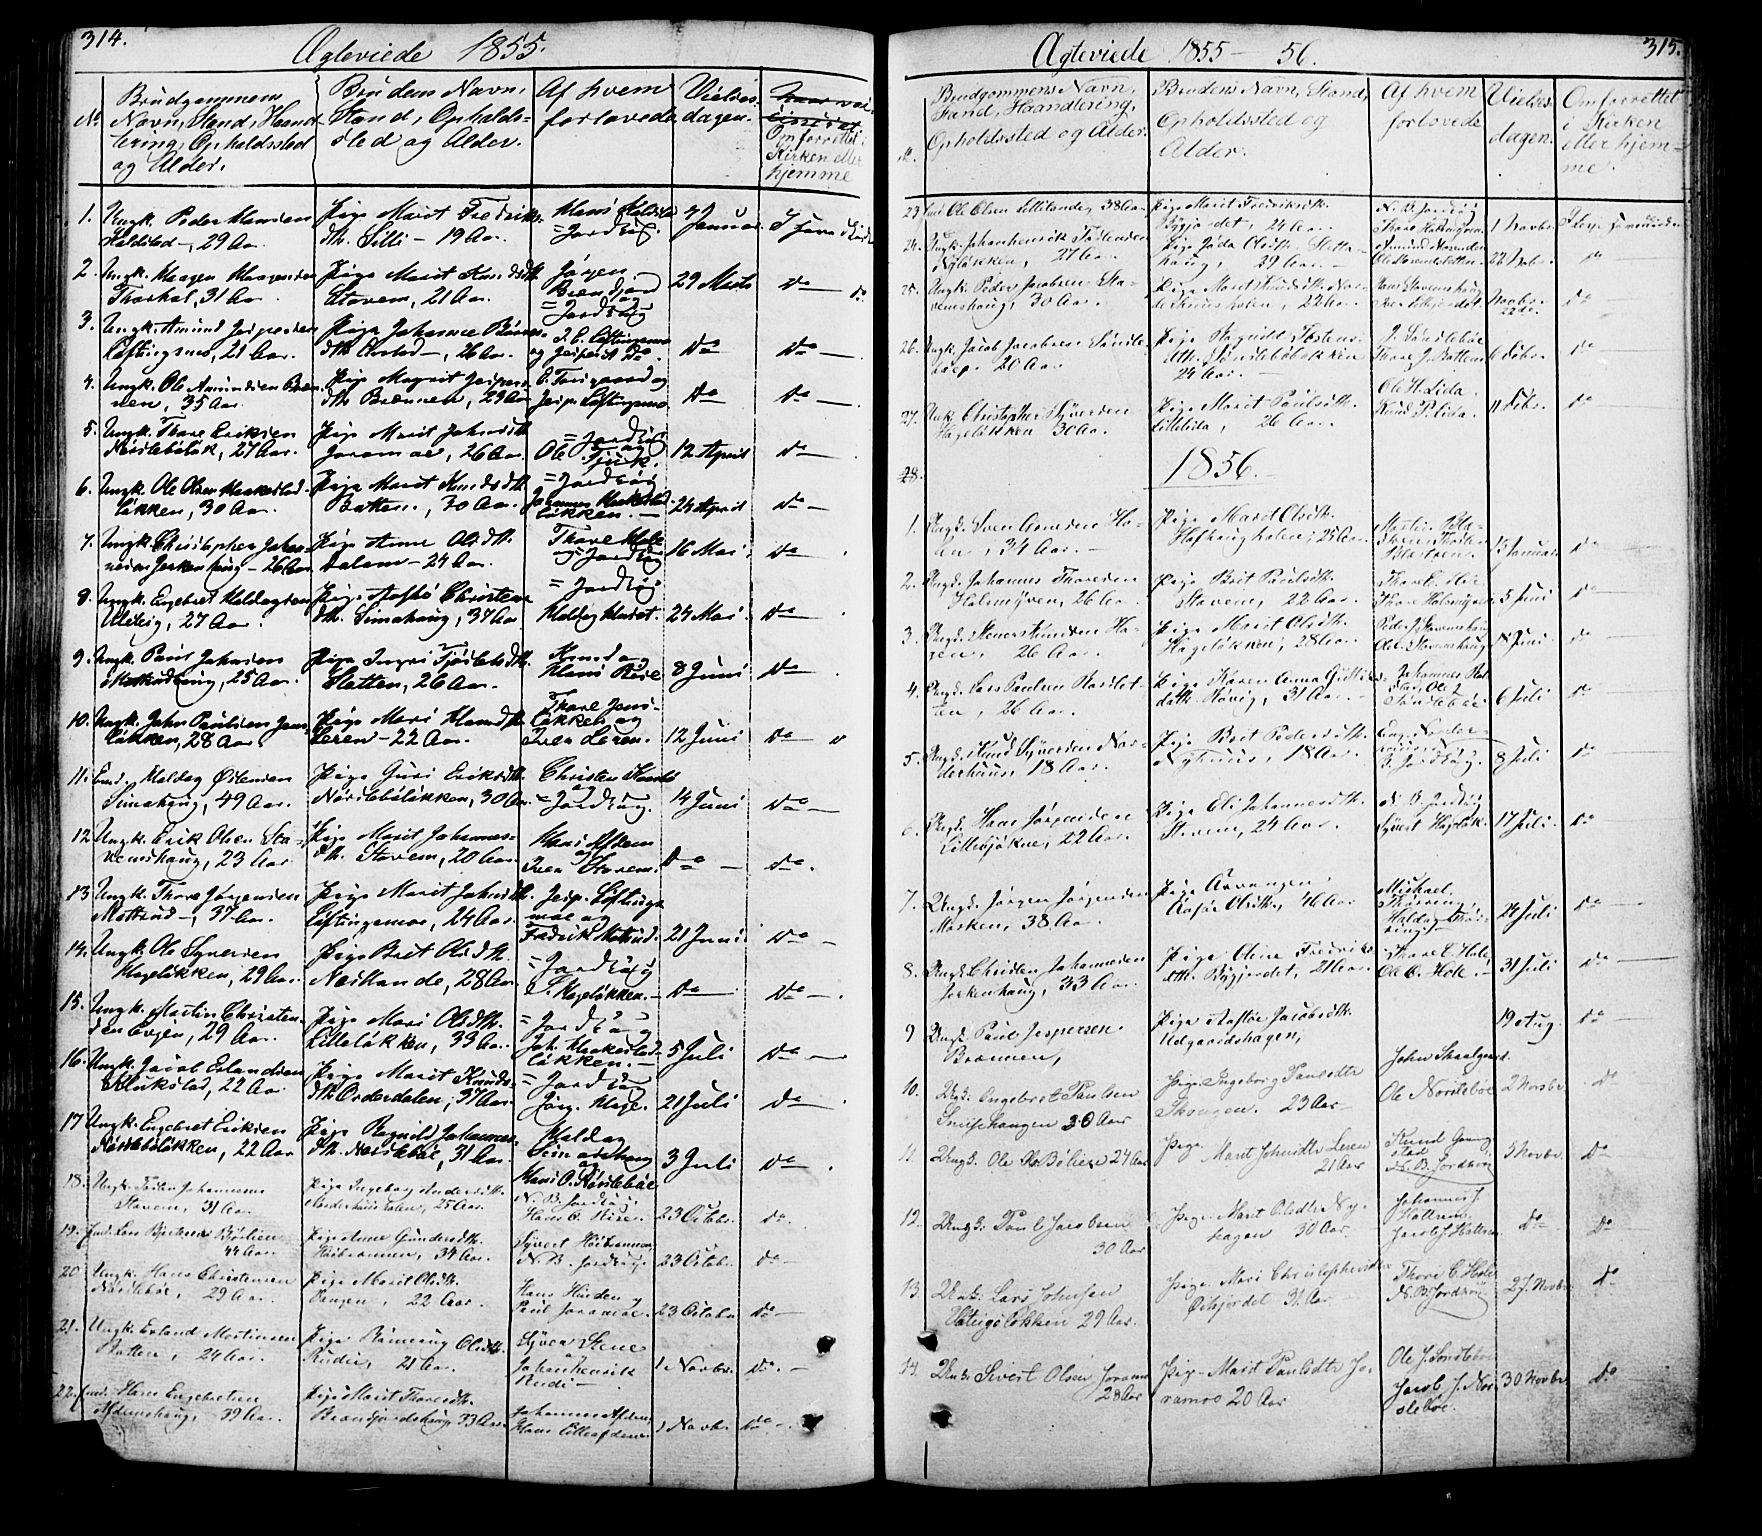 SAH, Lesja prestekontor, Klokkerbok nr. 5, 1850-1894, s. 314-315